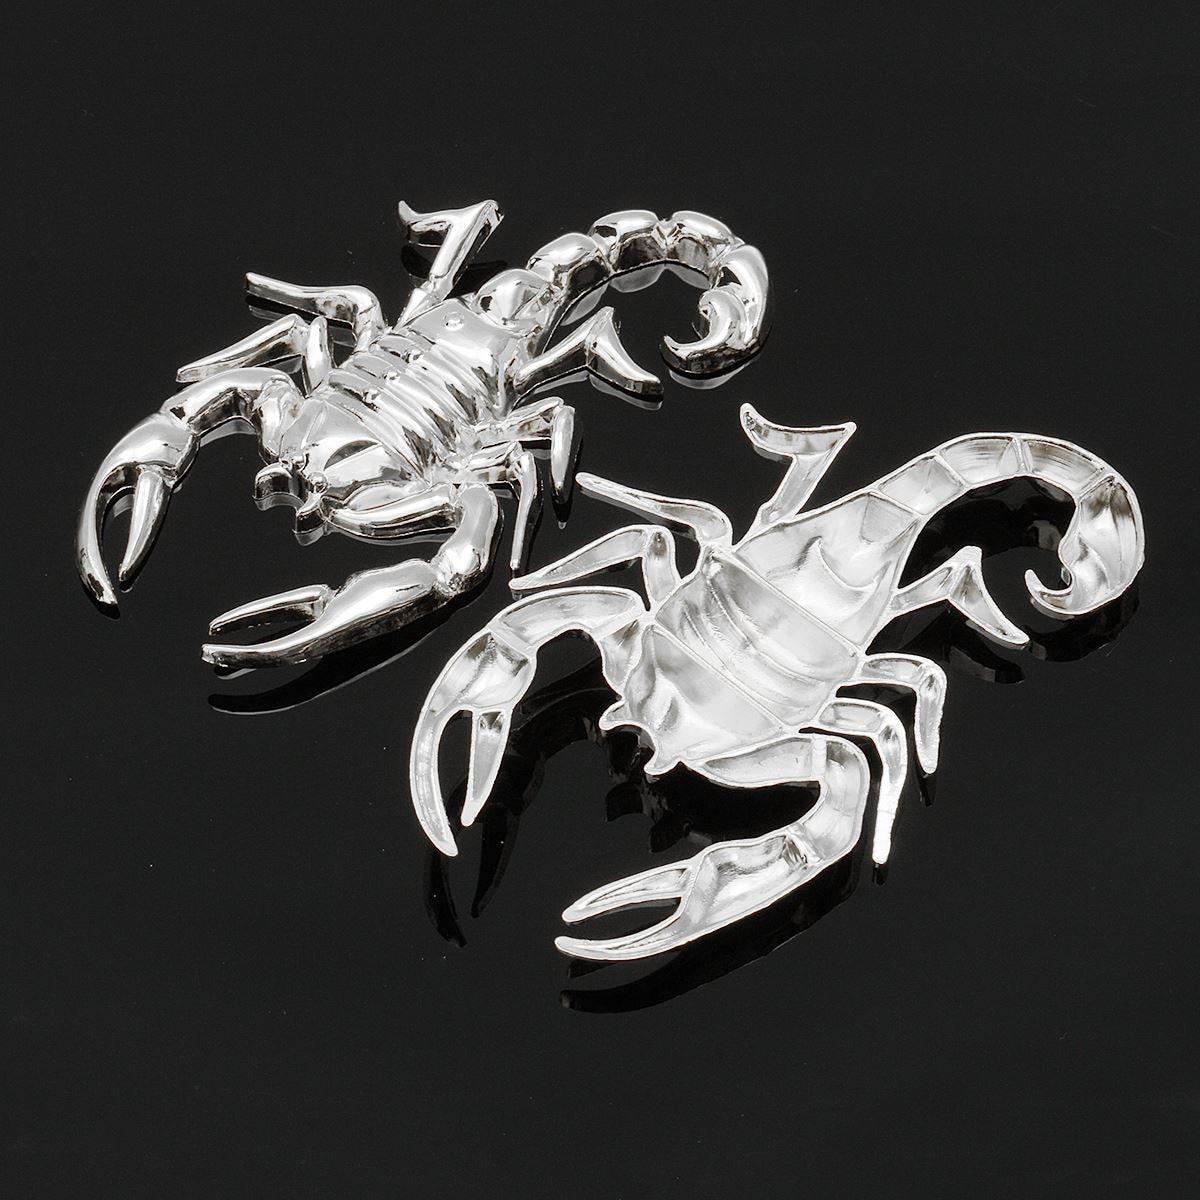 1Pair Motorcyle Sliver/Gold 3D Scorpion Gas Tank Fairing Decal Sticker For Harley/Honda/Yamaha/Suzuki Metal